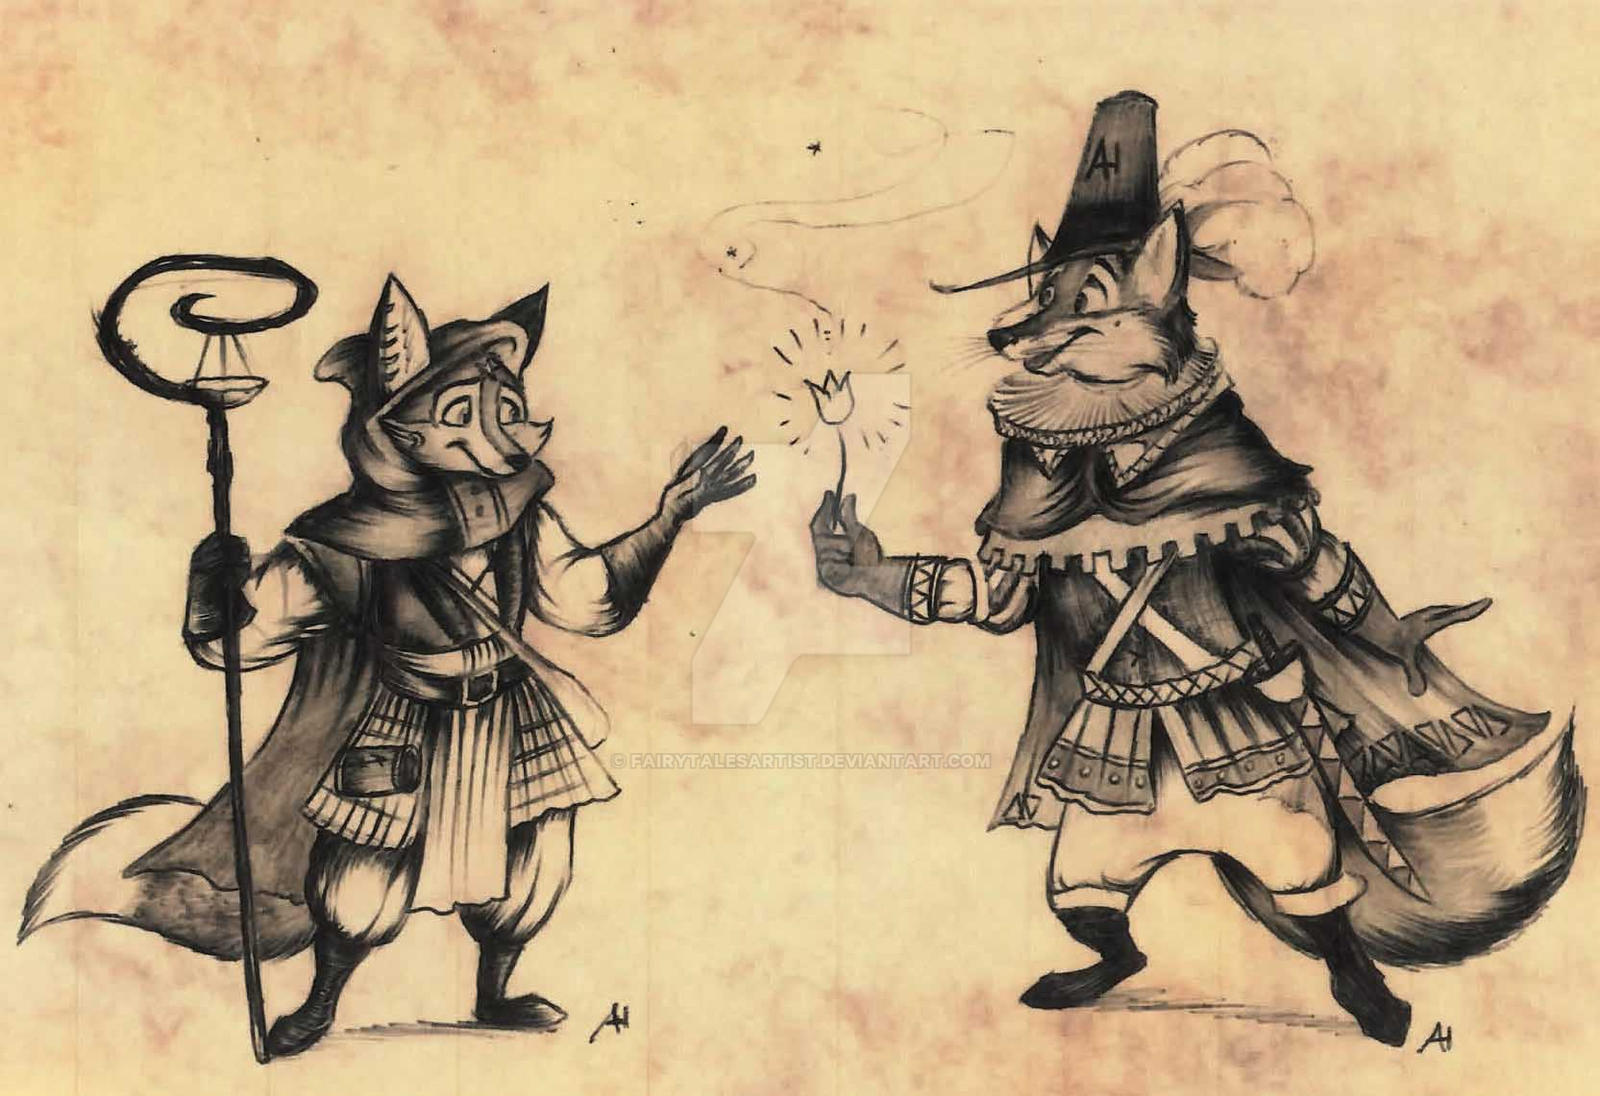 Foxboy the FairytalesArtist meet FortunataFox by FairytalesArtist